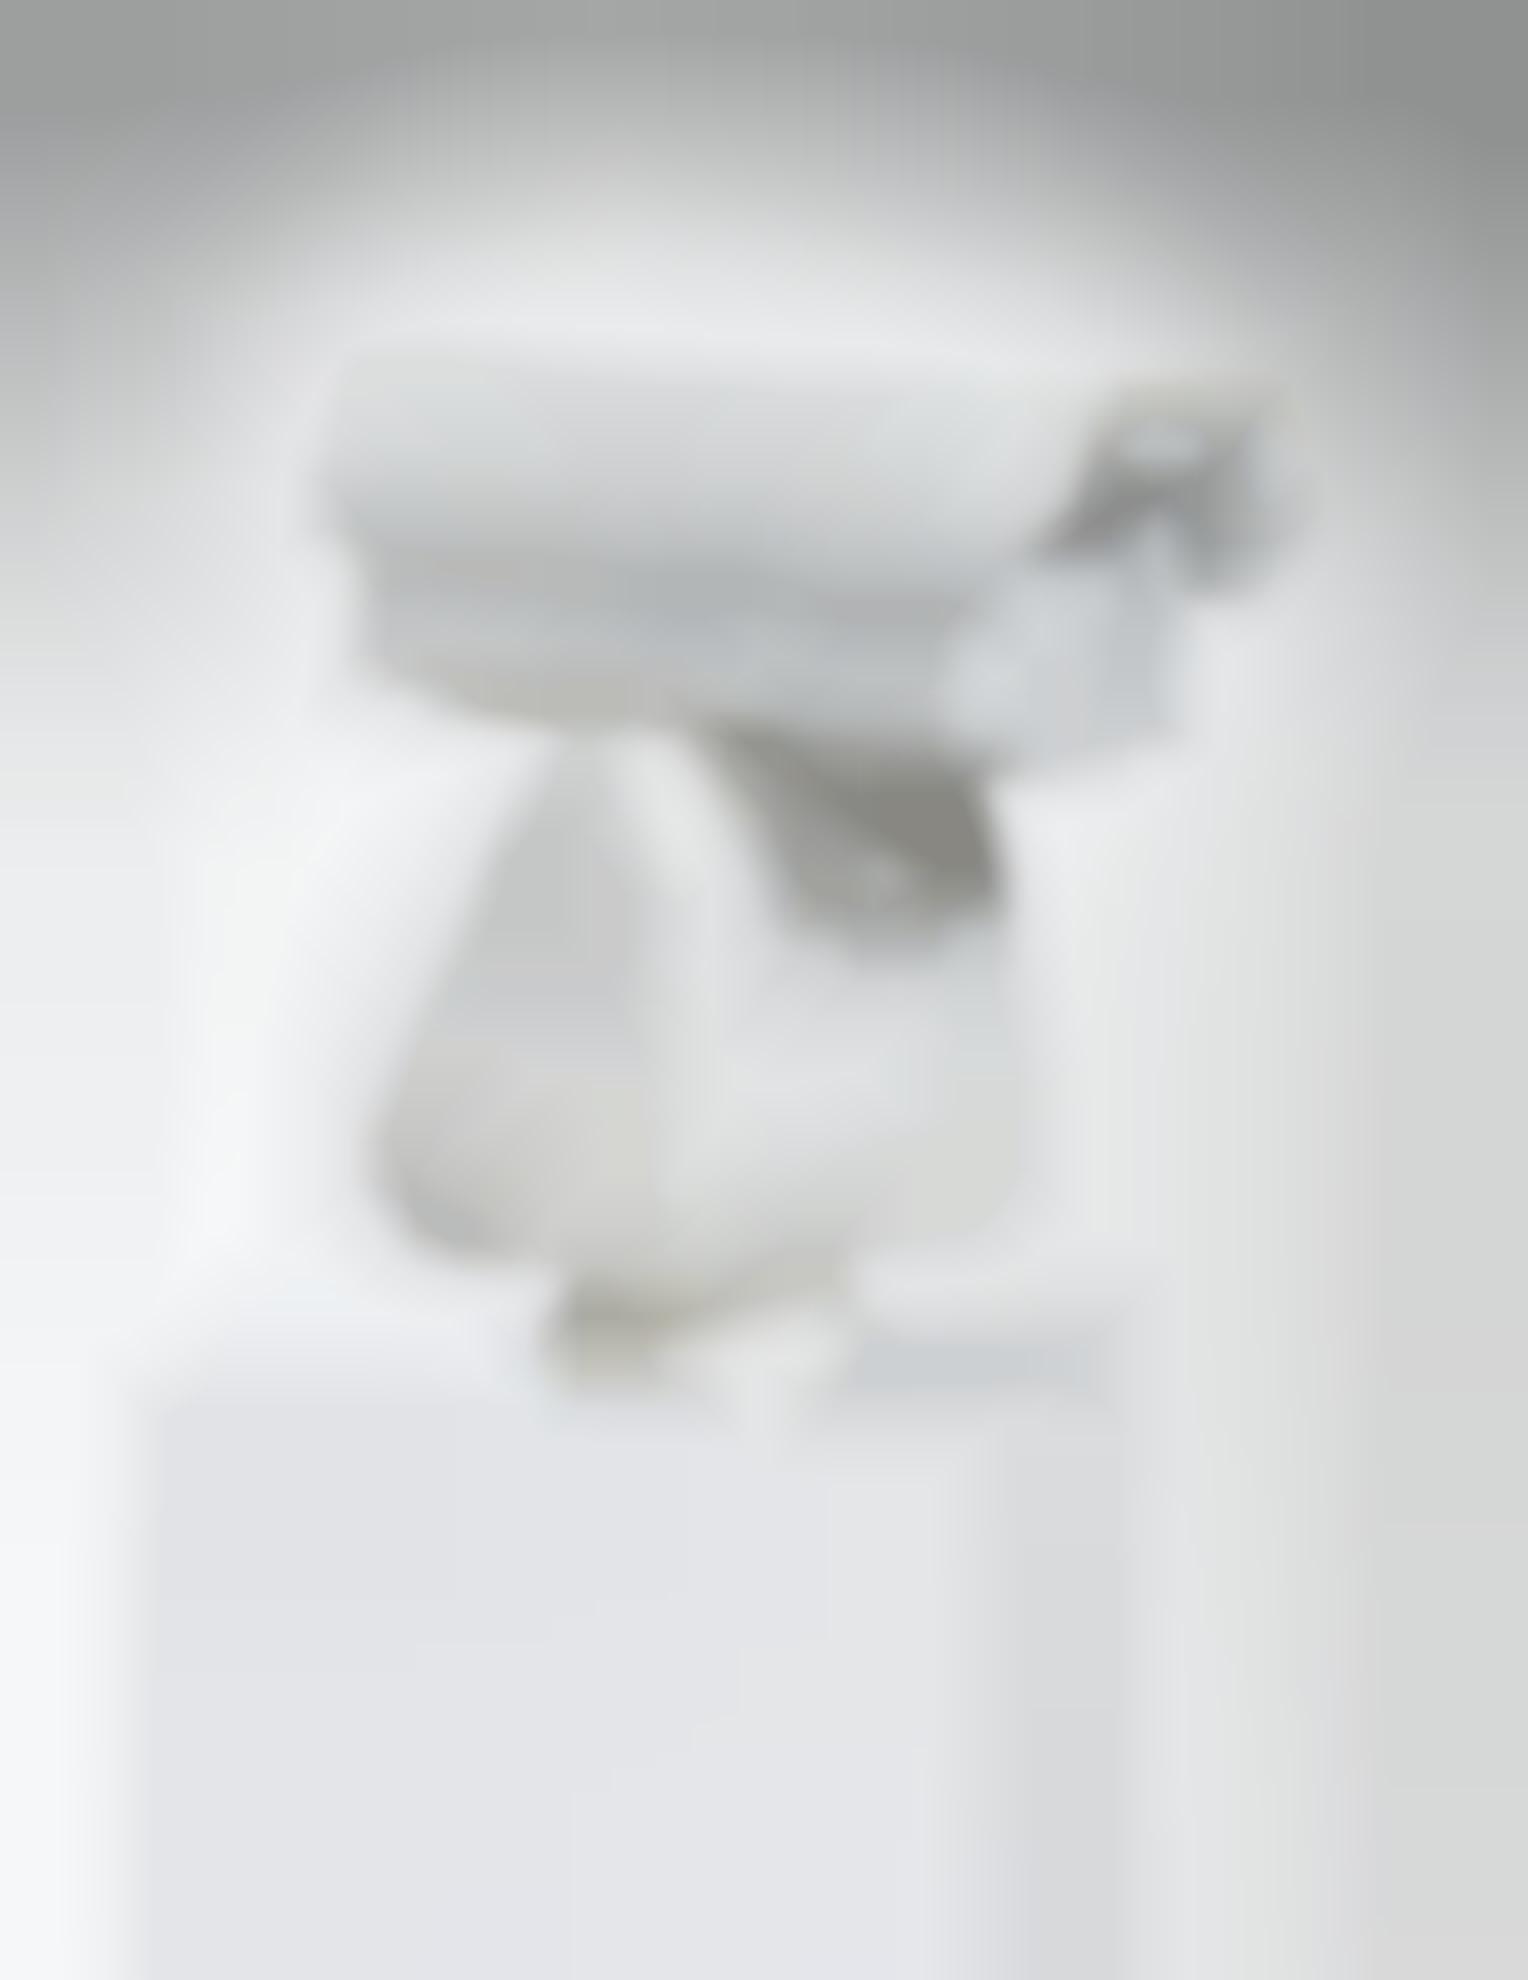 Ai Weiwei-Surveillance Camera-2010